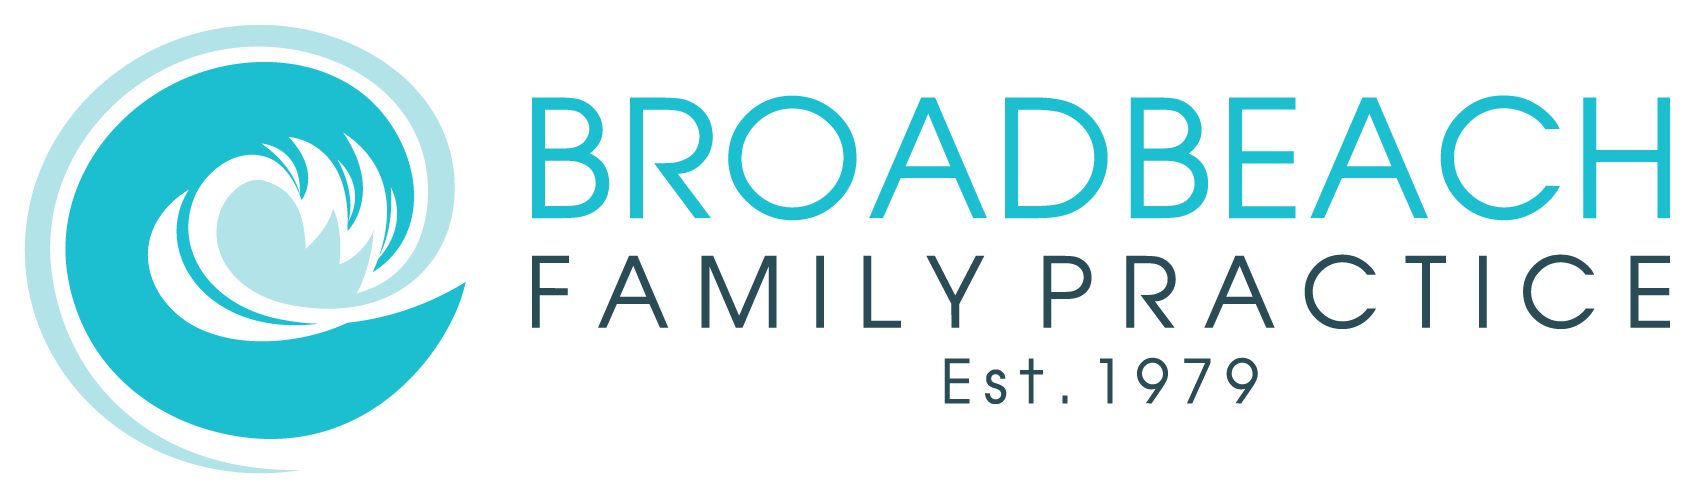 Broadbeach Family Practice